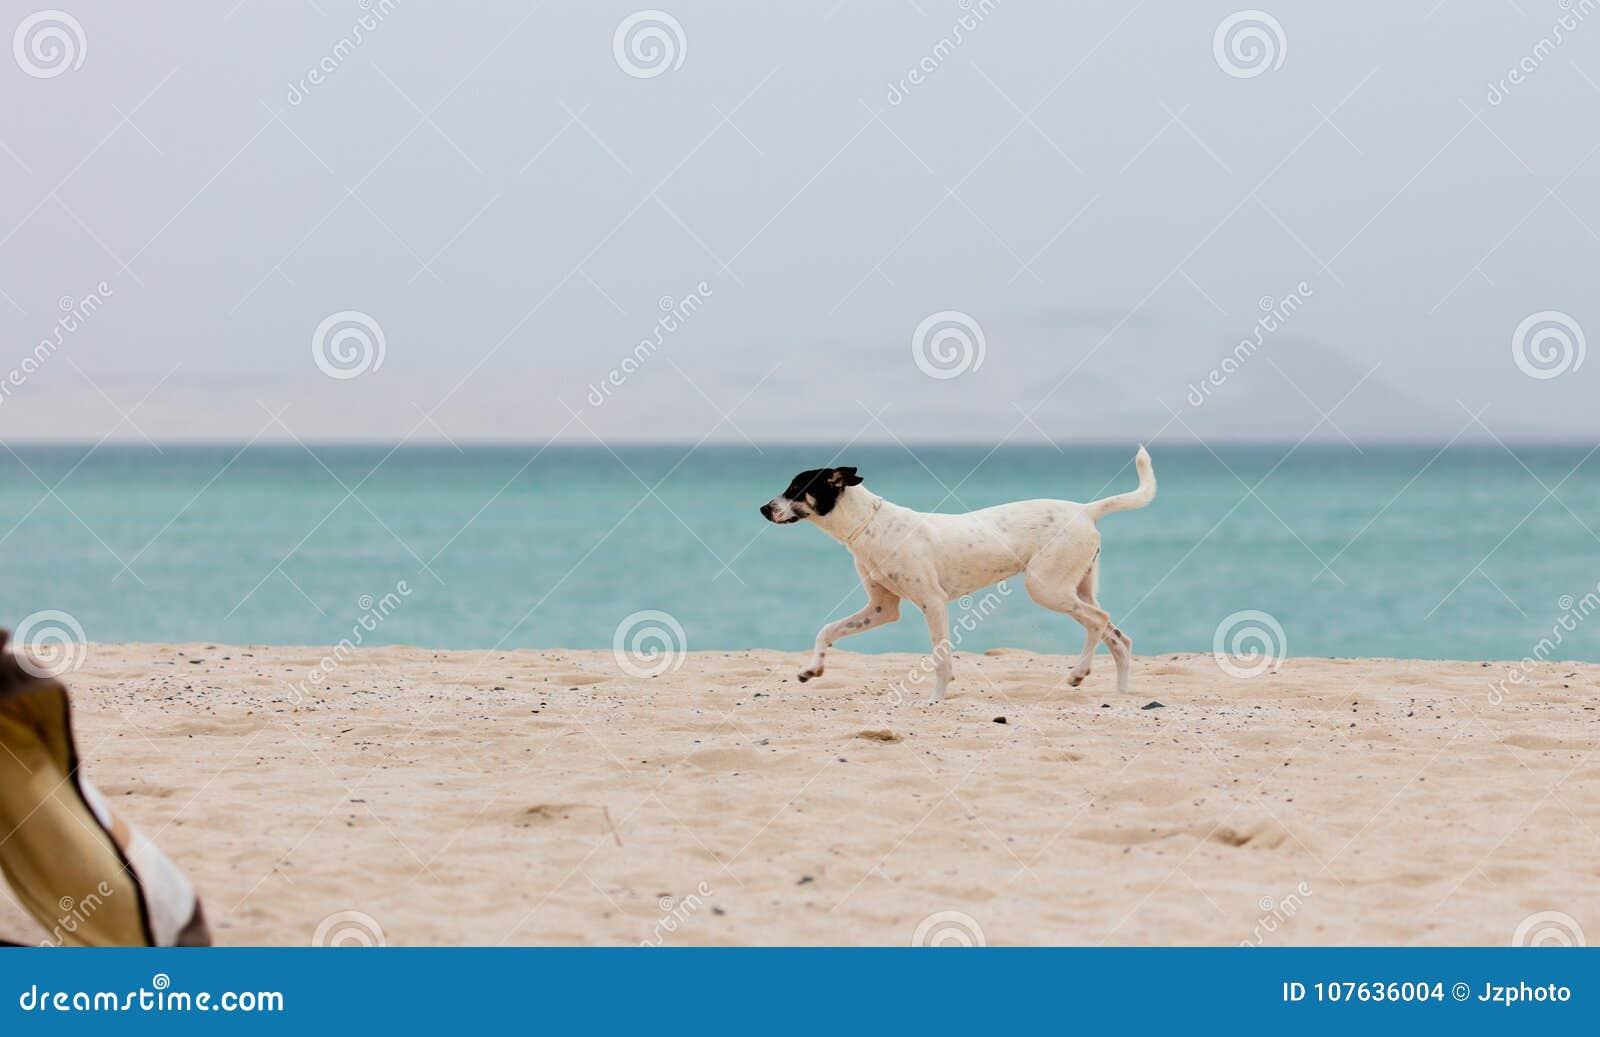 Cute Dog Running On A Beach Stock Photo Image Of Shore Heat